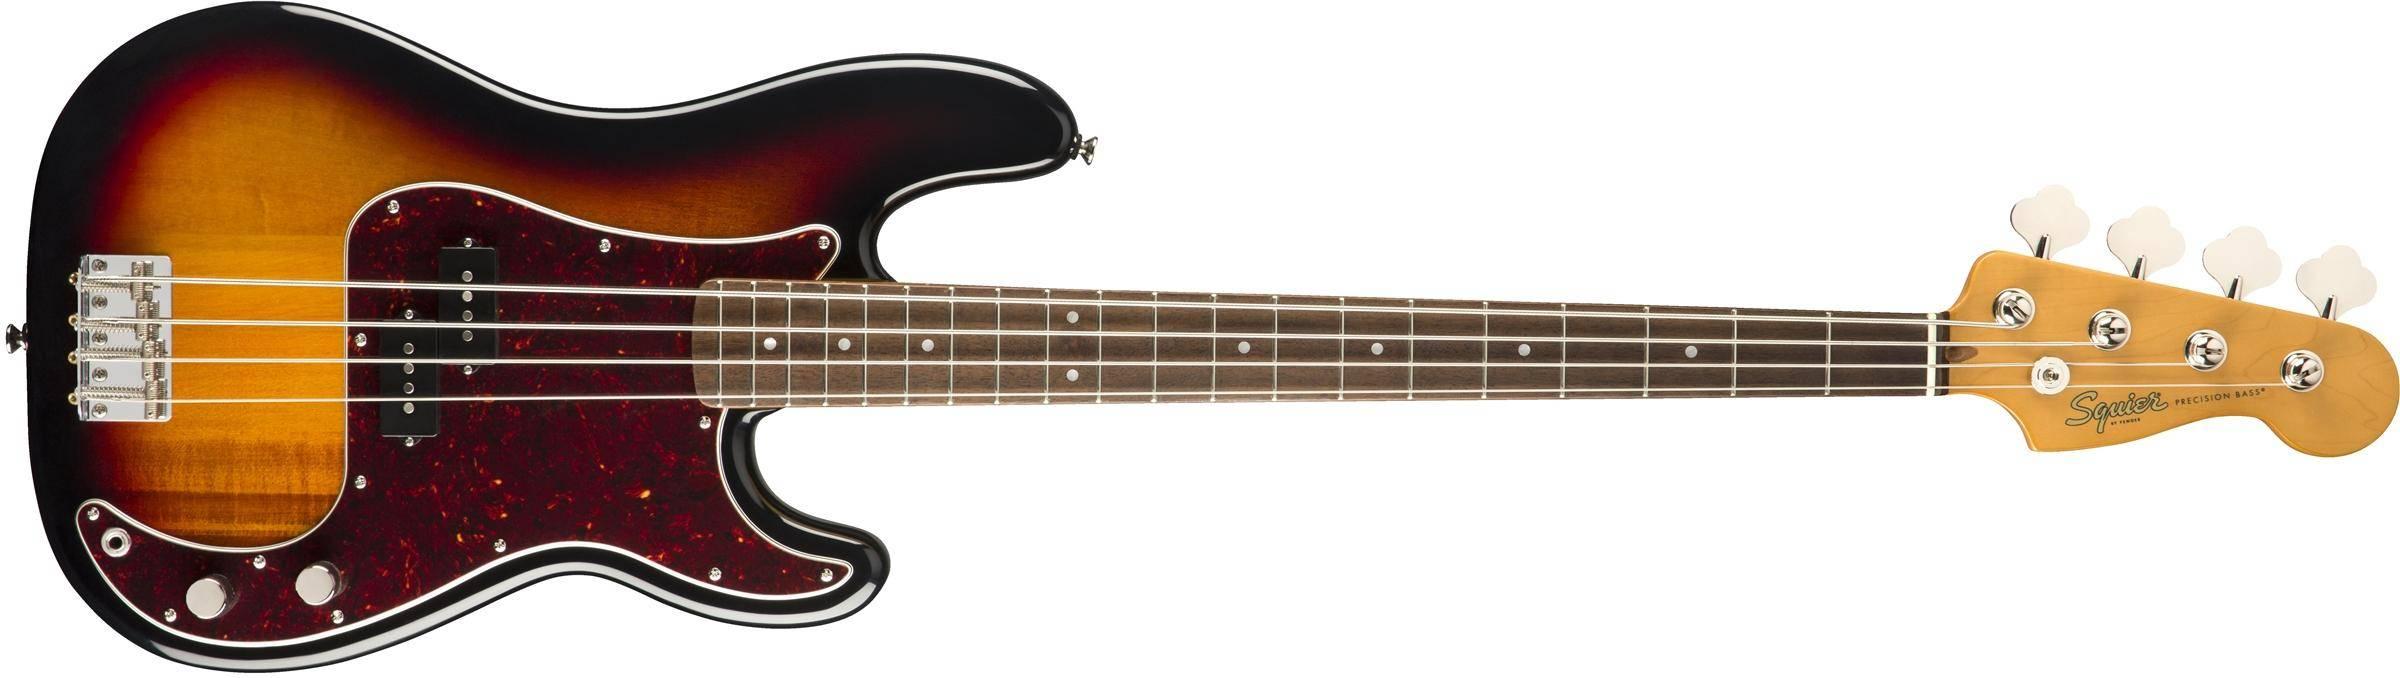 Classic Vibe '60s Precision Bass, Laurel Fingerboard - 3 Tone Sunburst